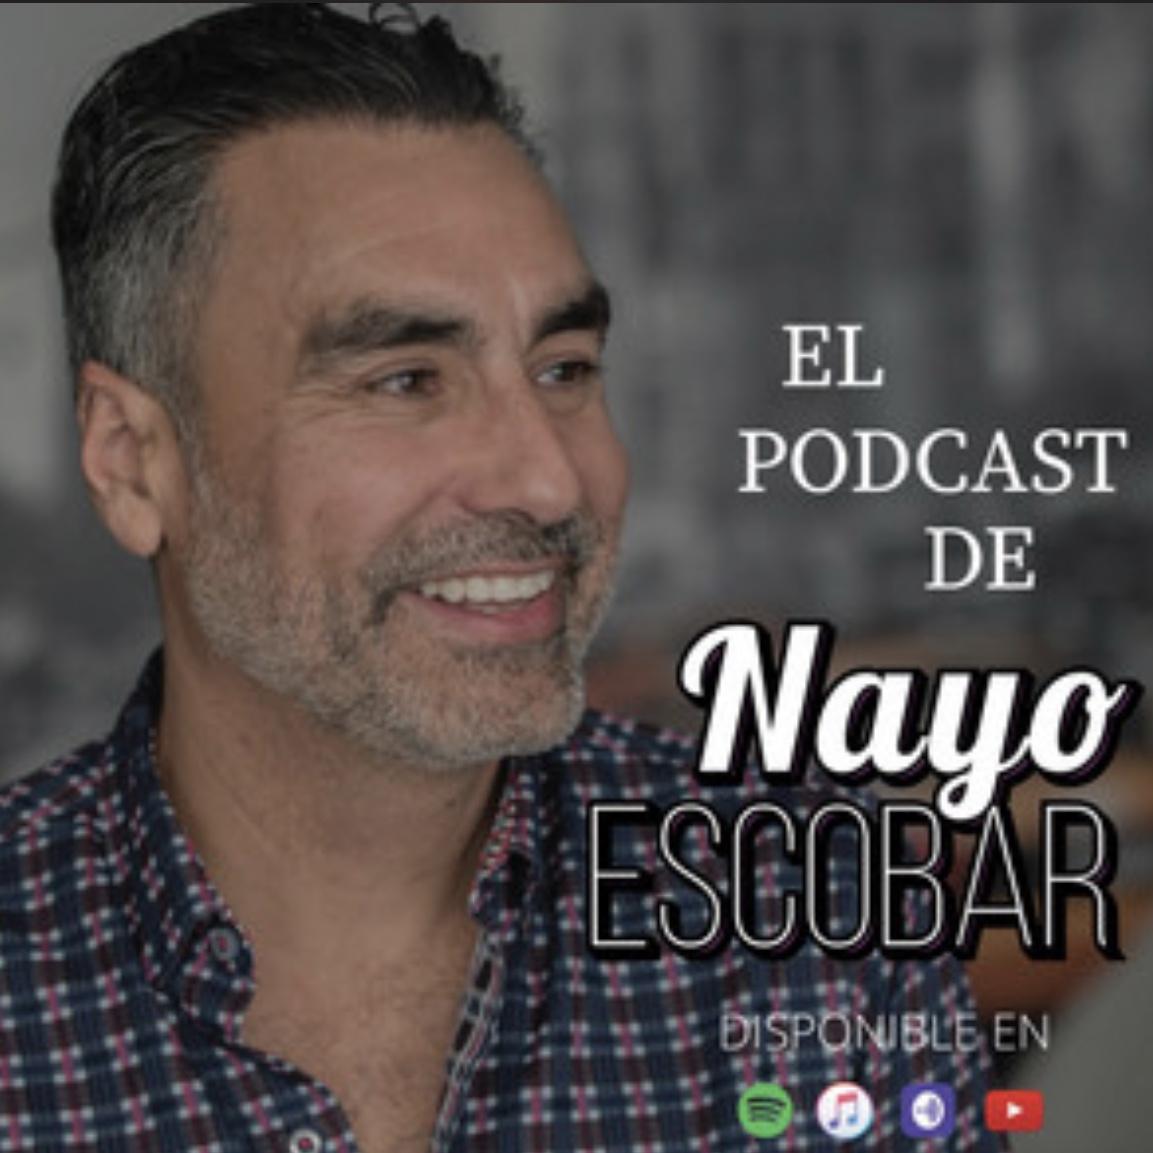 El Podcast de Nayo Escobar